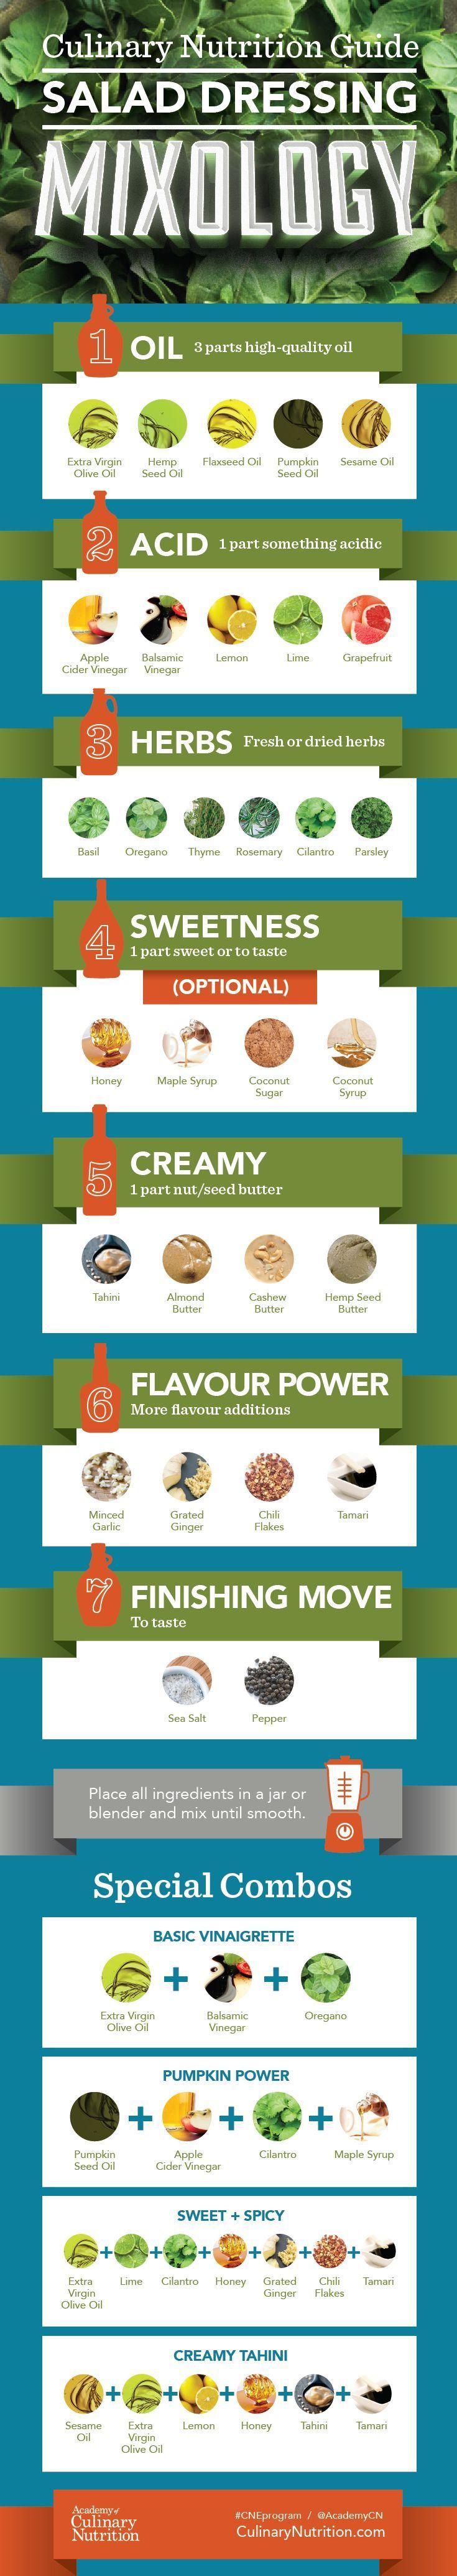 Recipes for healthy homemade salad dressings #healthy #homemade